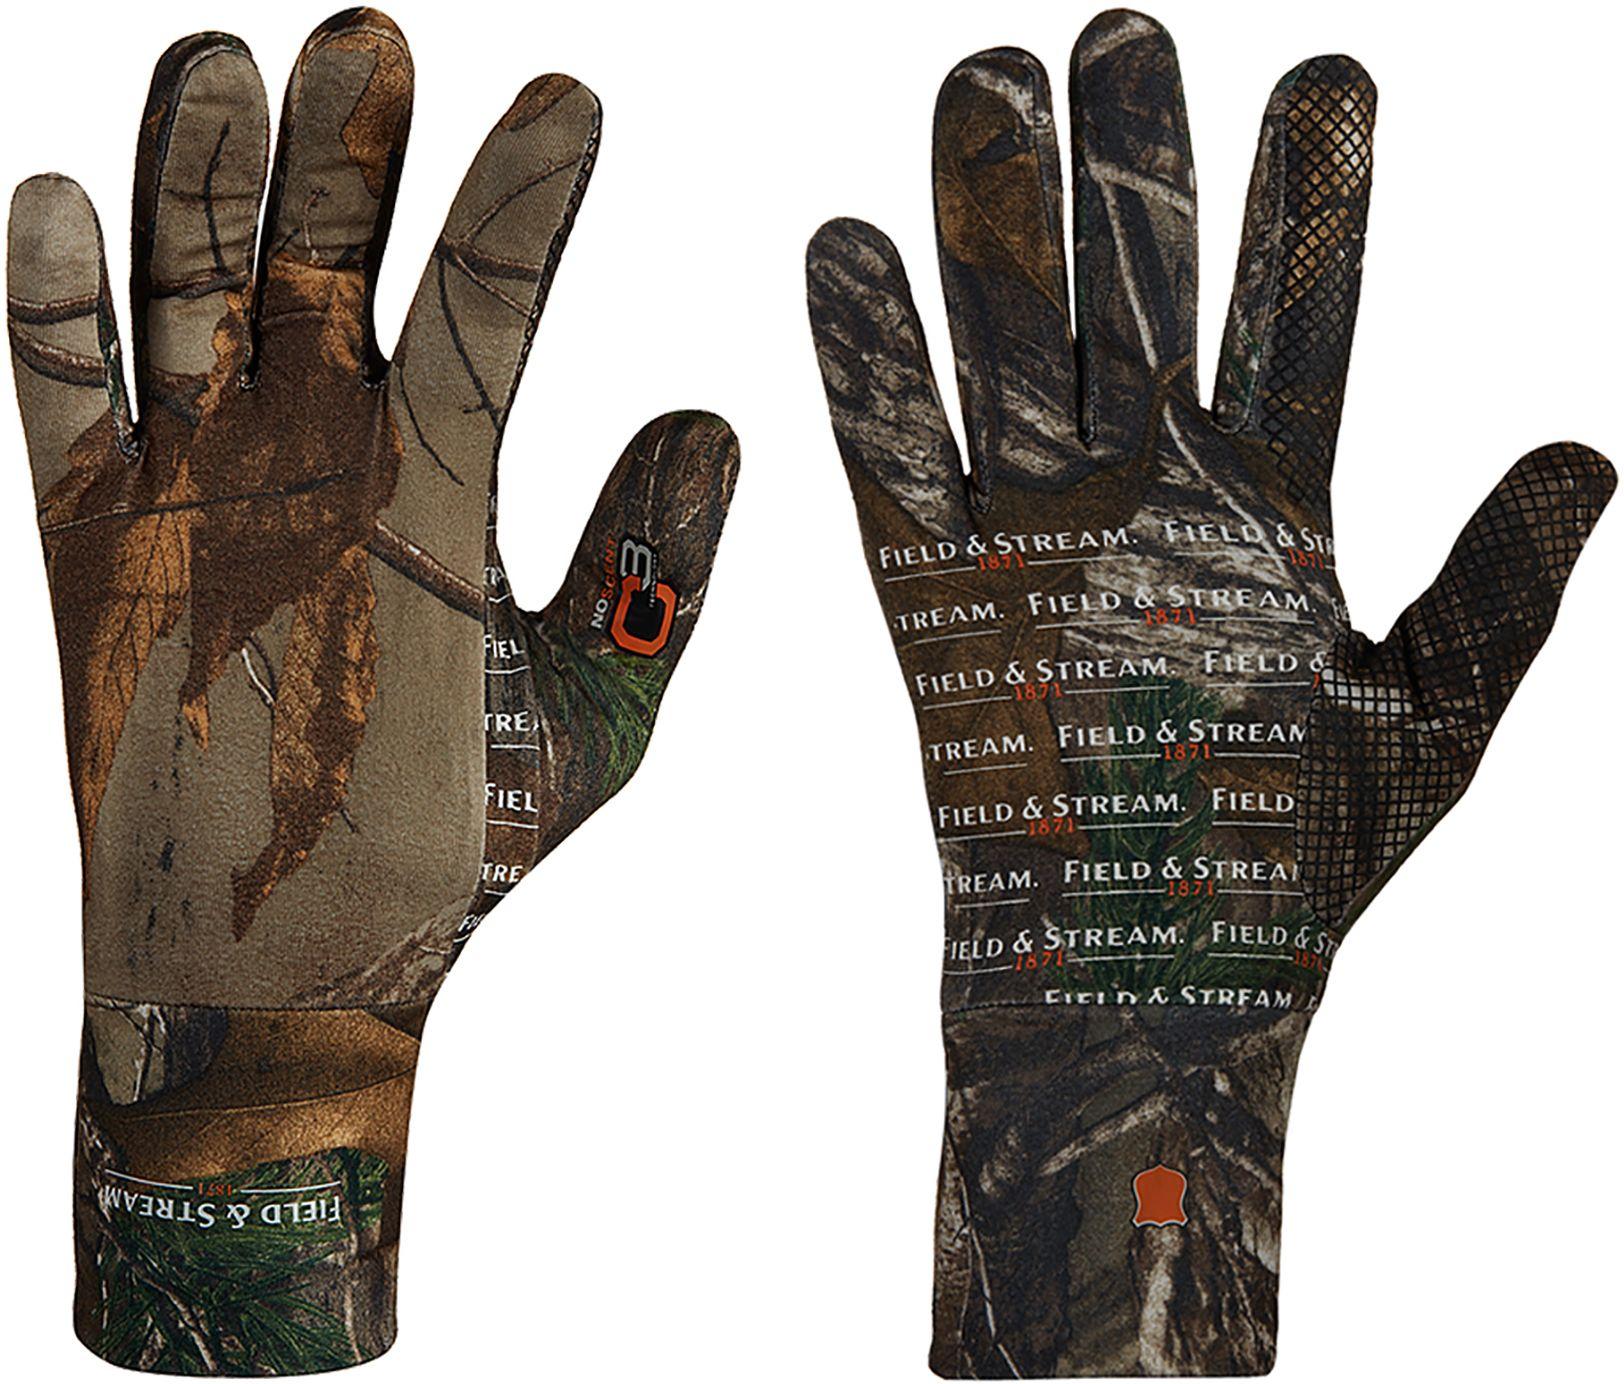 Field & Stream Men's Base Defense Lightweight Gloves, Brown thumbnail